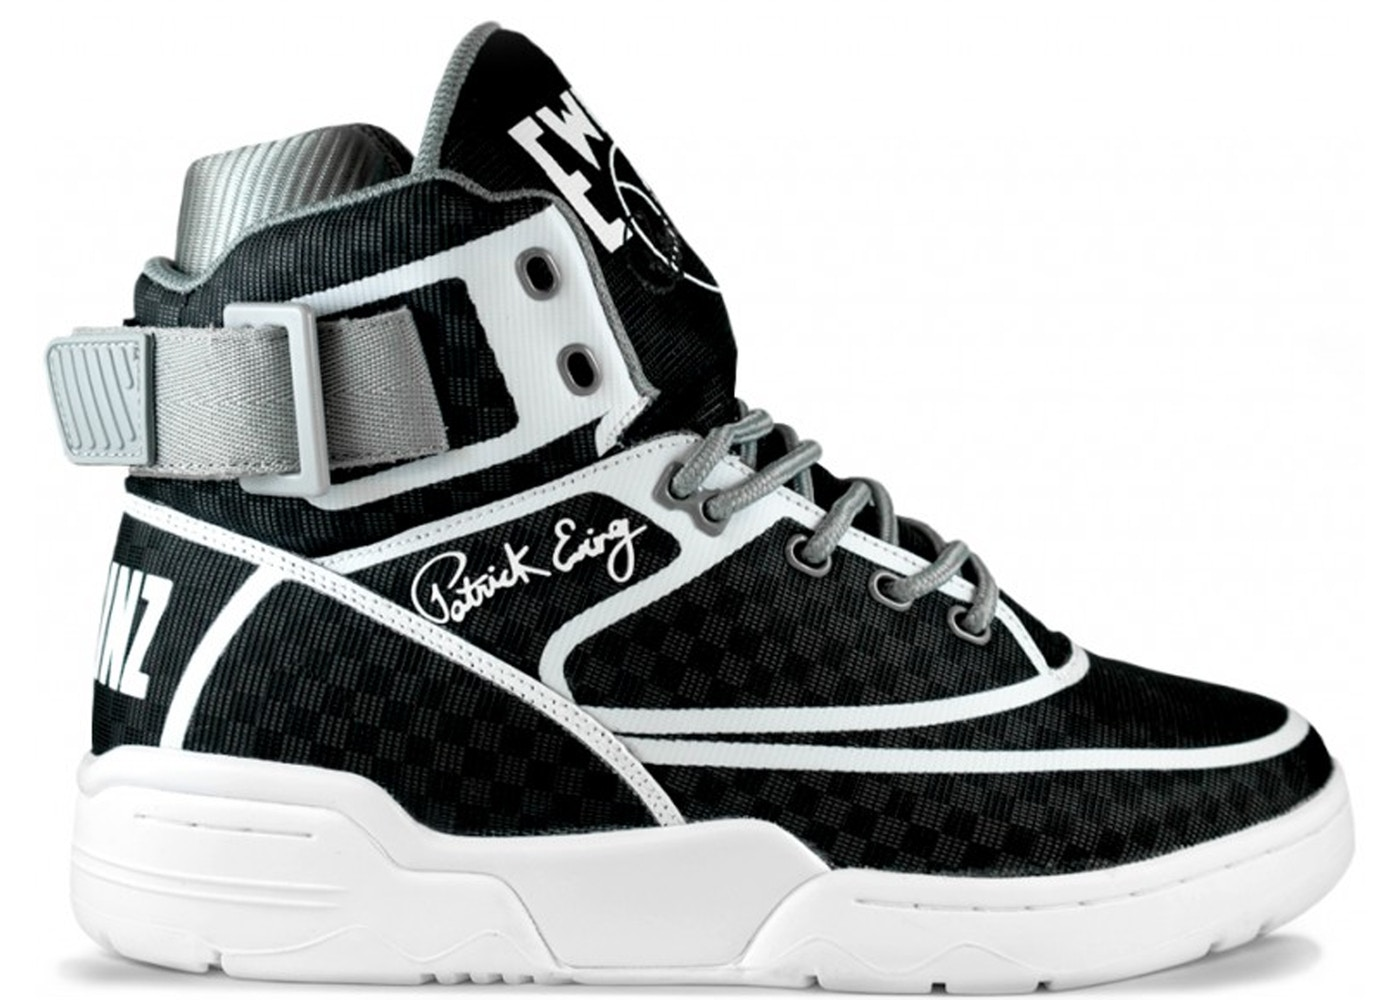 brand new b5ec8 572ef Website For Discount Ewing 33 Hi 2 Chainz ... 33 HI x 2Chainz White Black  ...